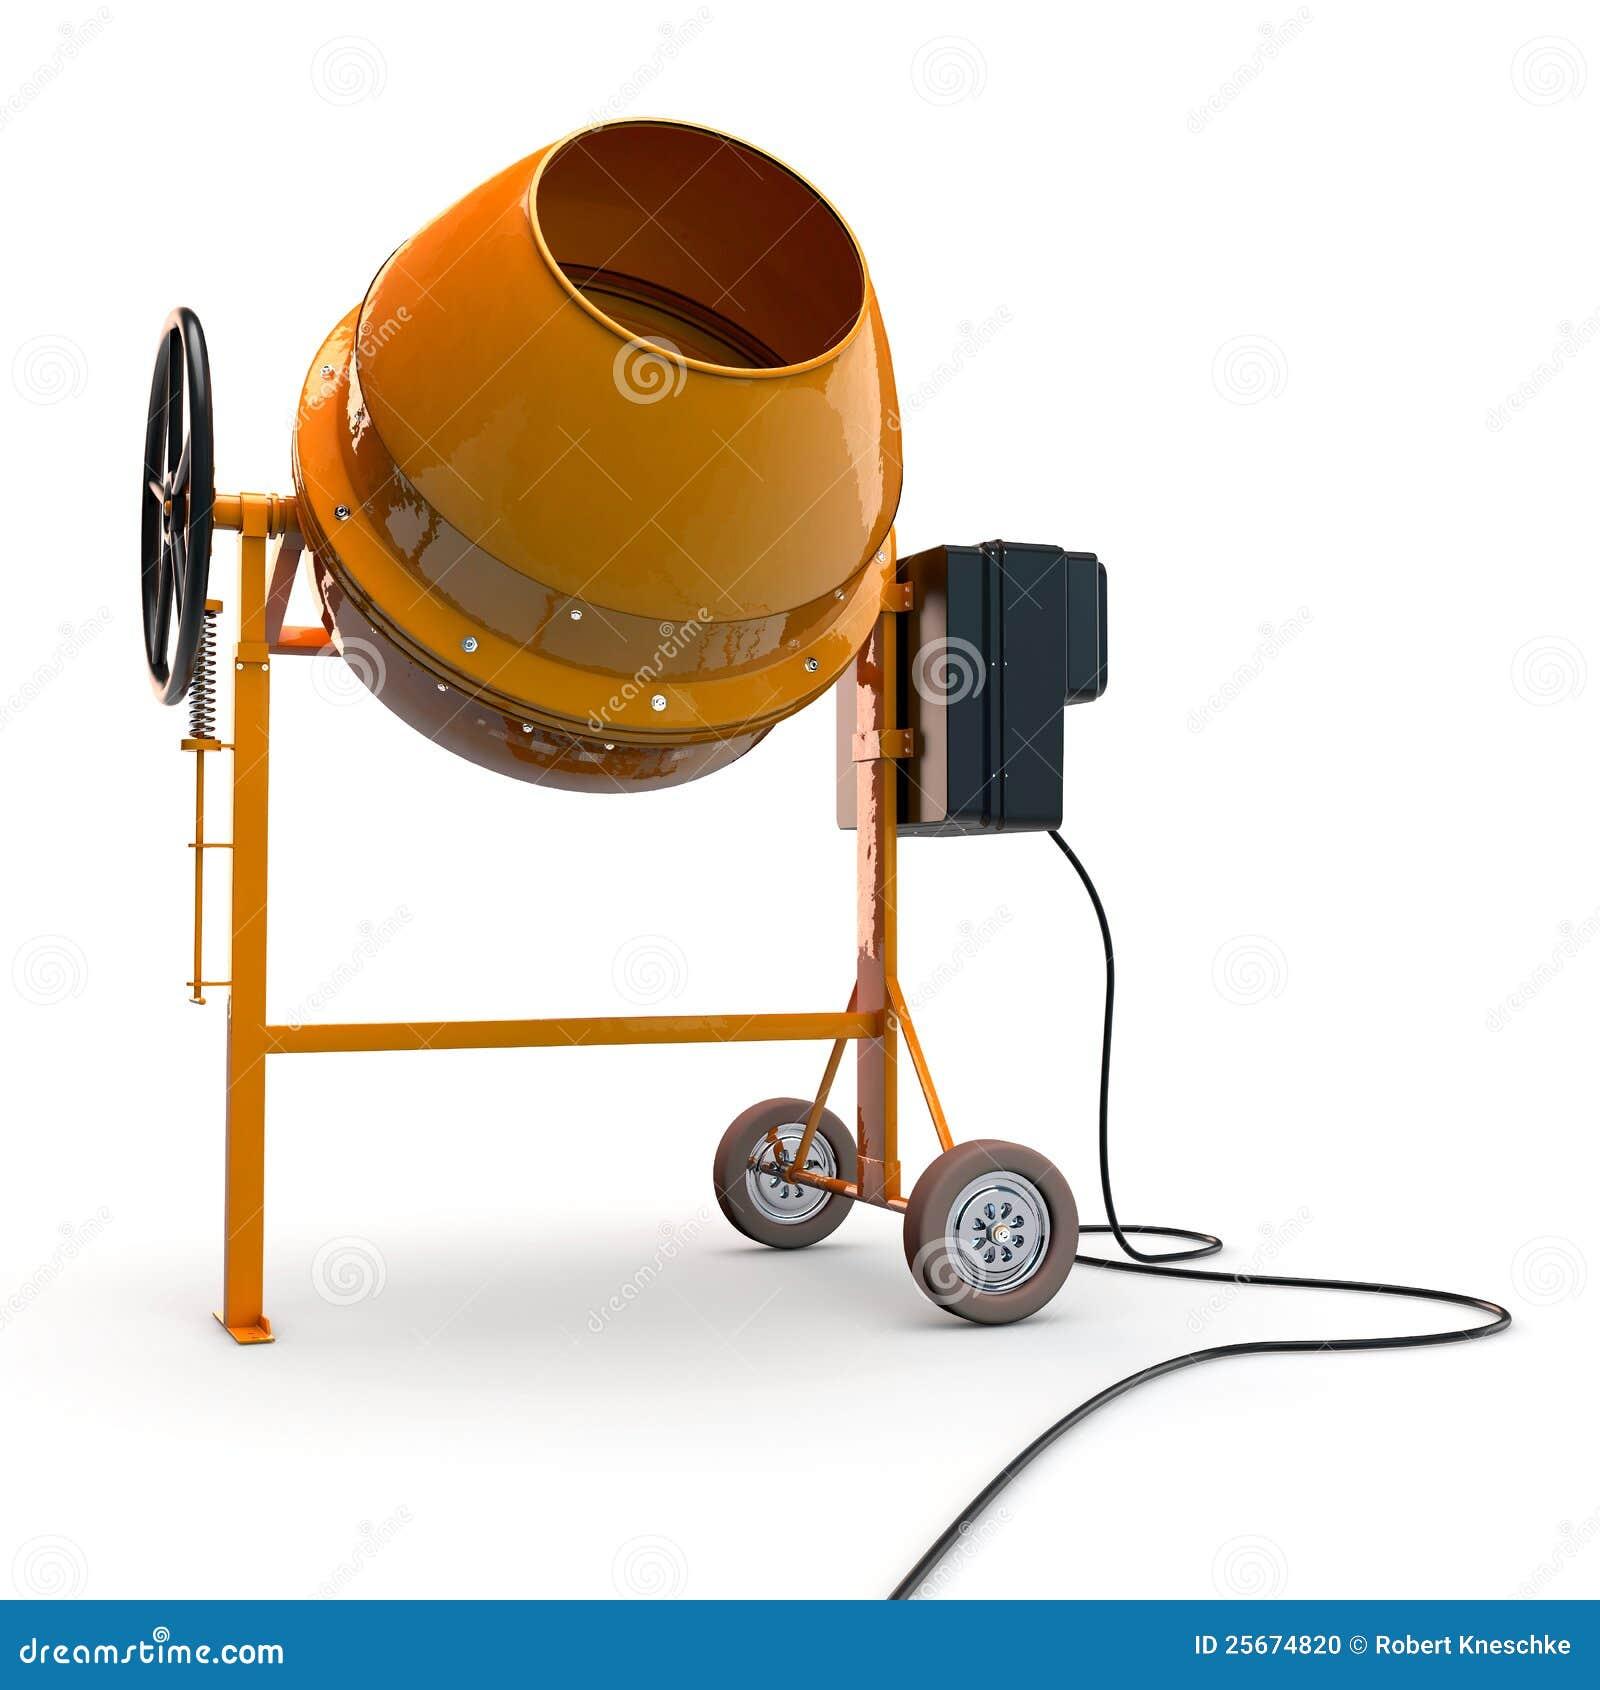 Concrete Mixing Animation : Concrete mixer stock photo image